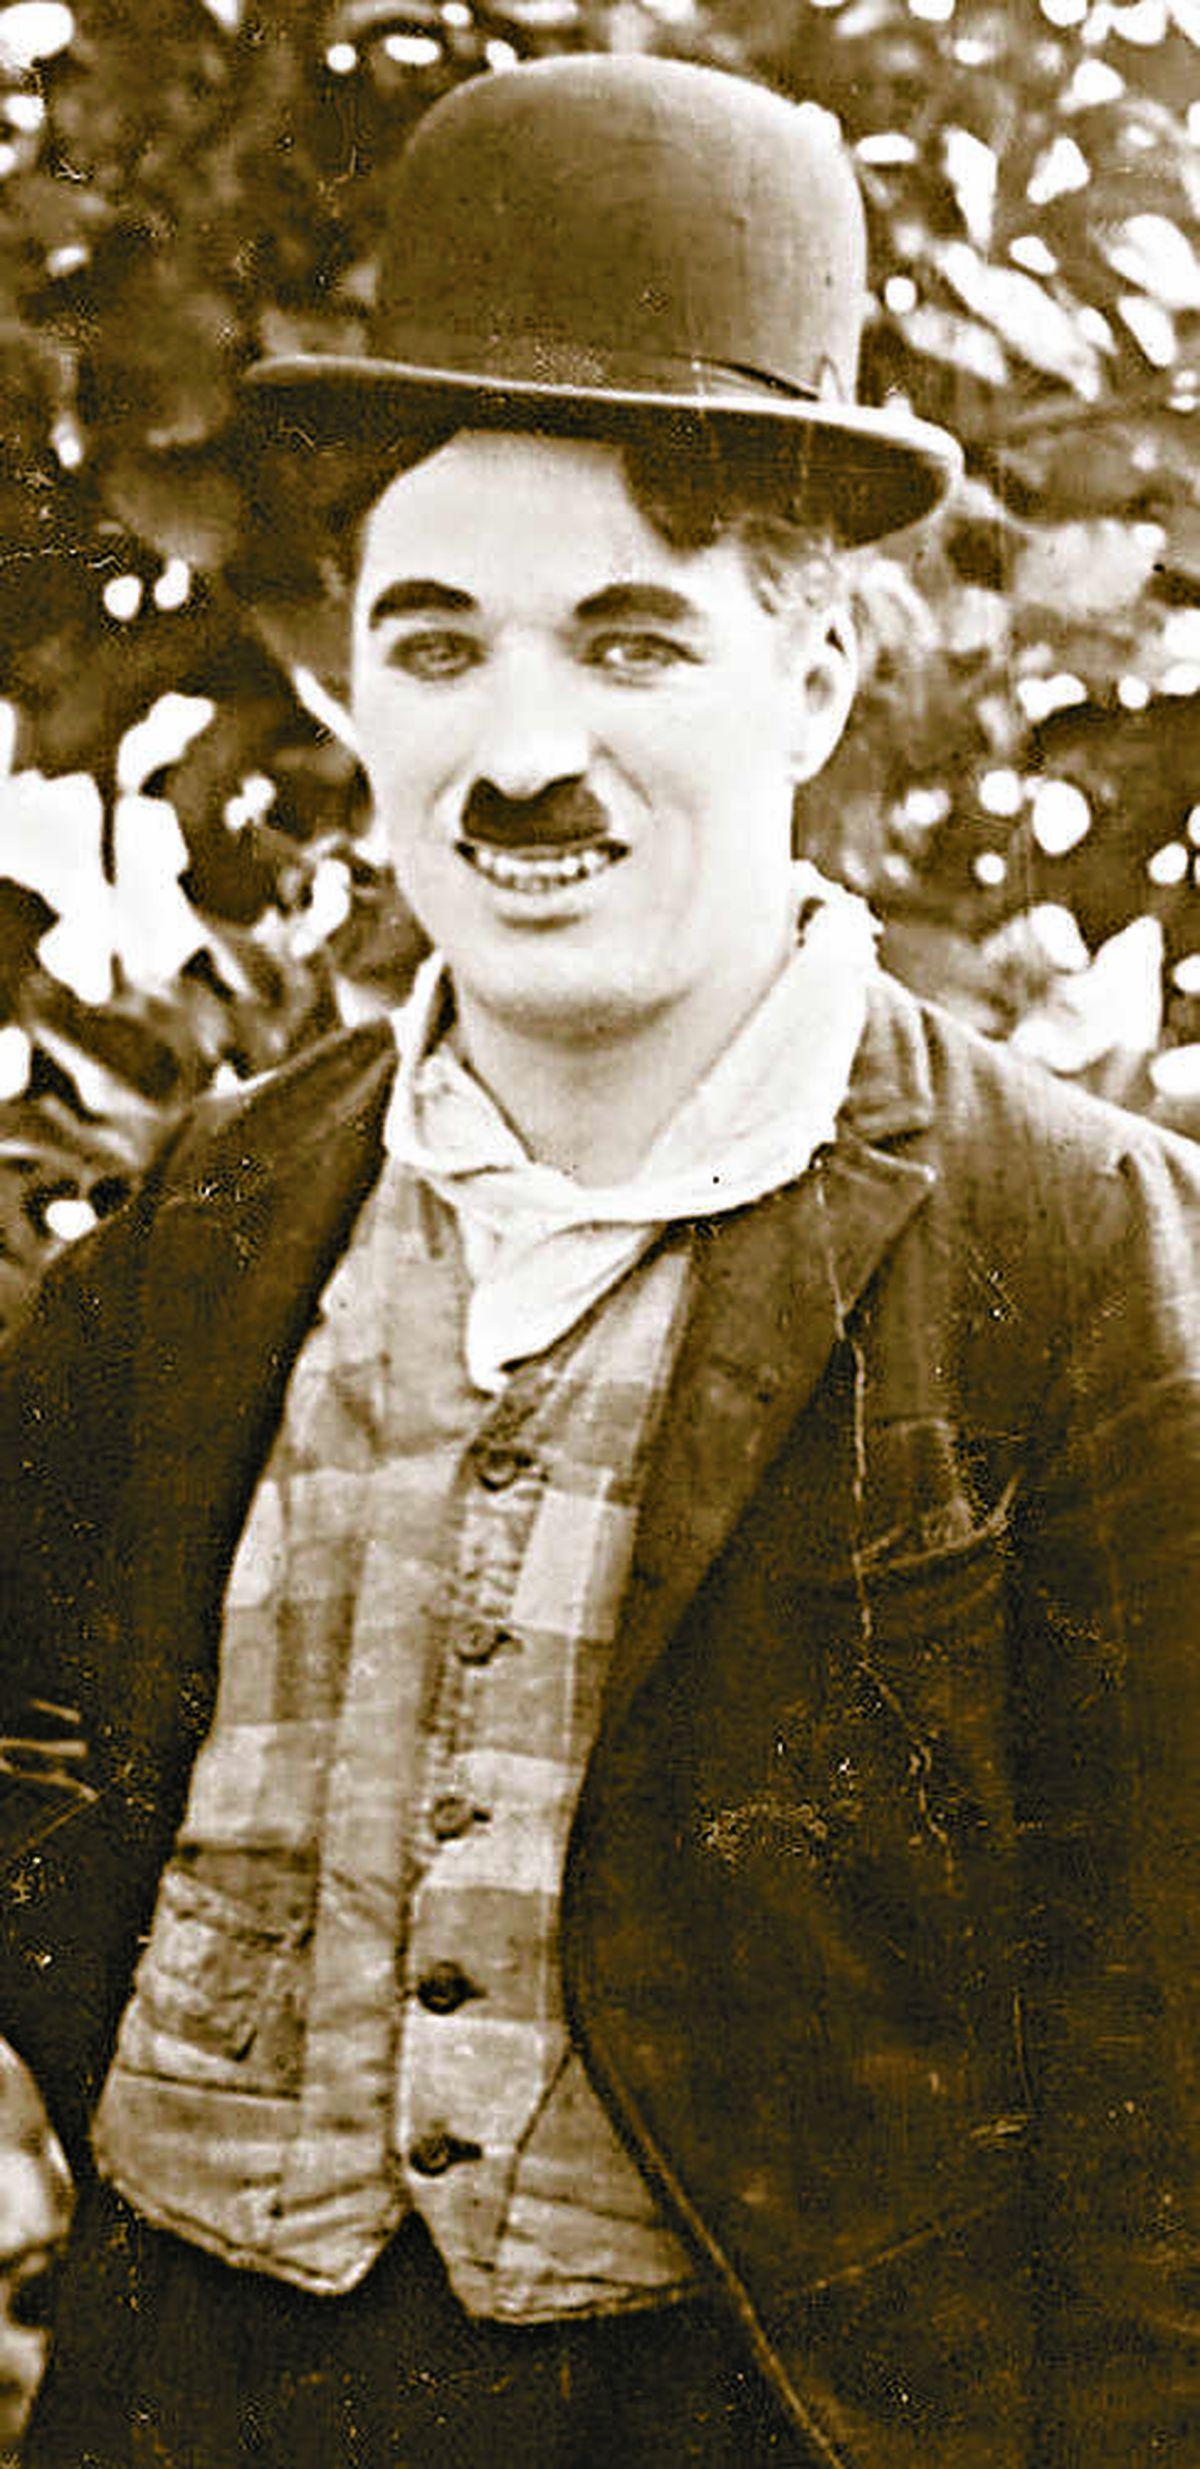 The comic icon, Charlie Chaplin